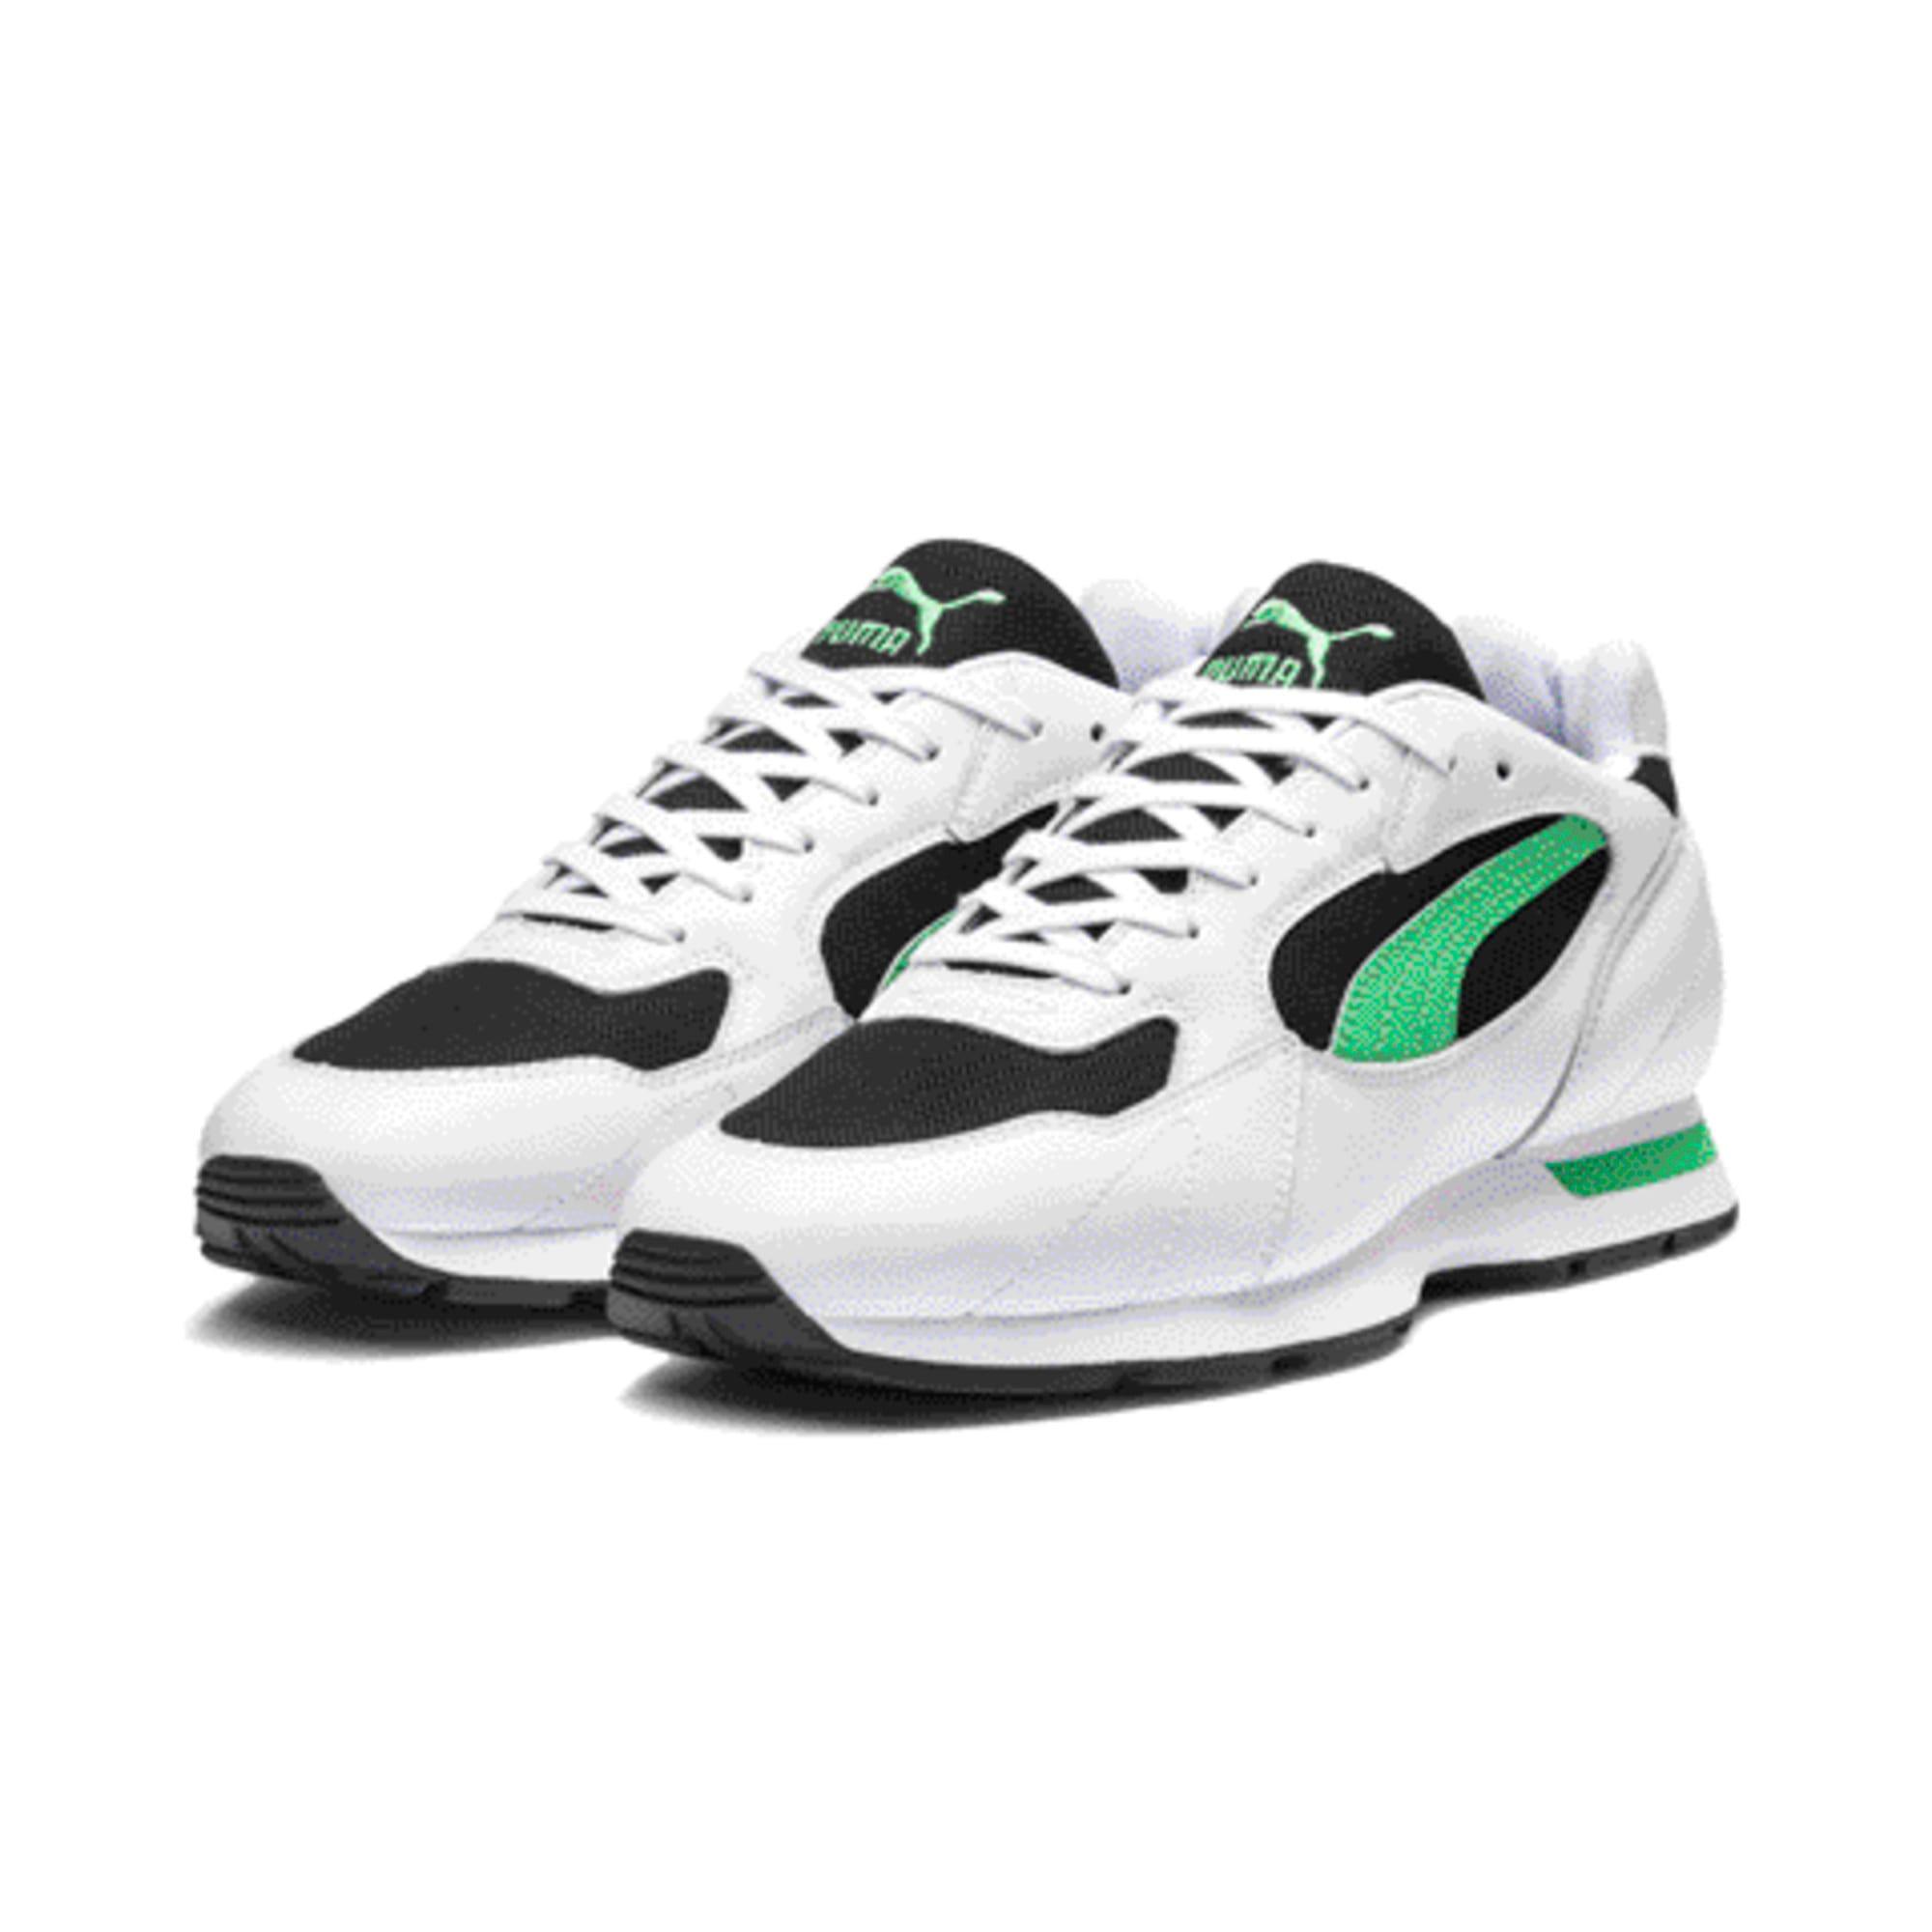 Proclaim Men's Sneakers